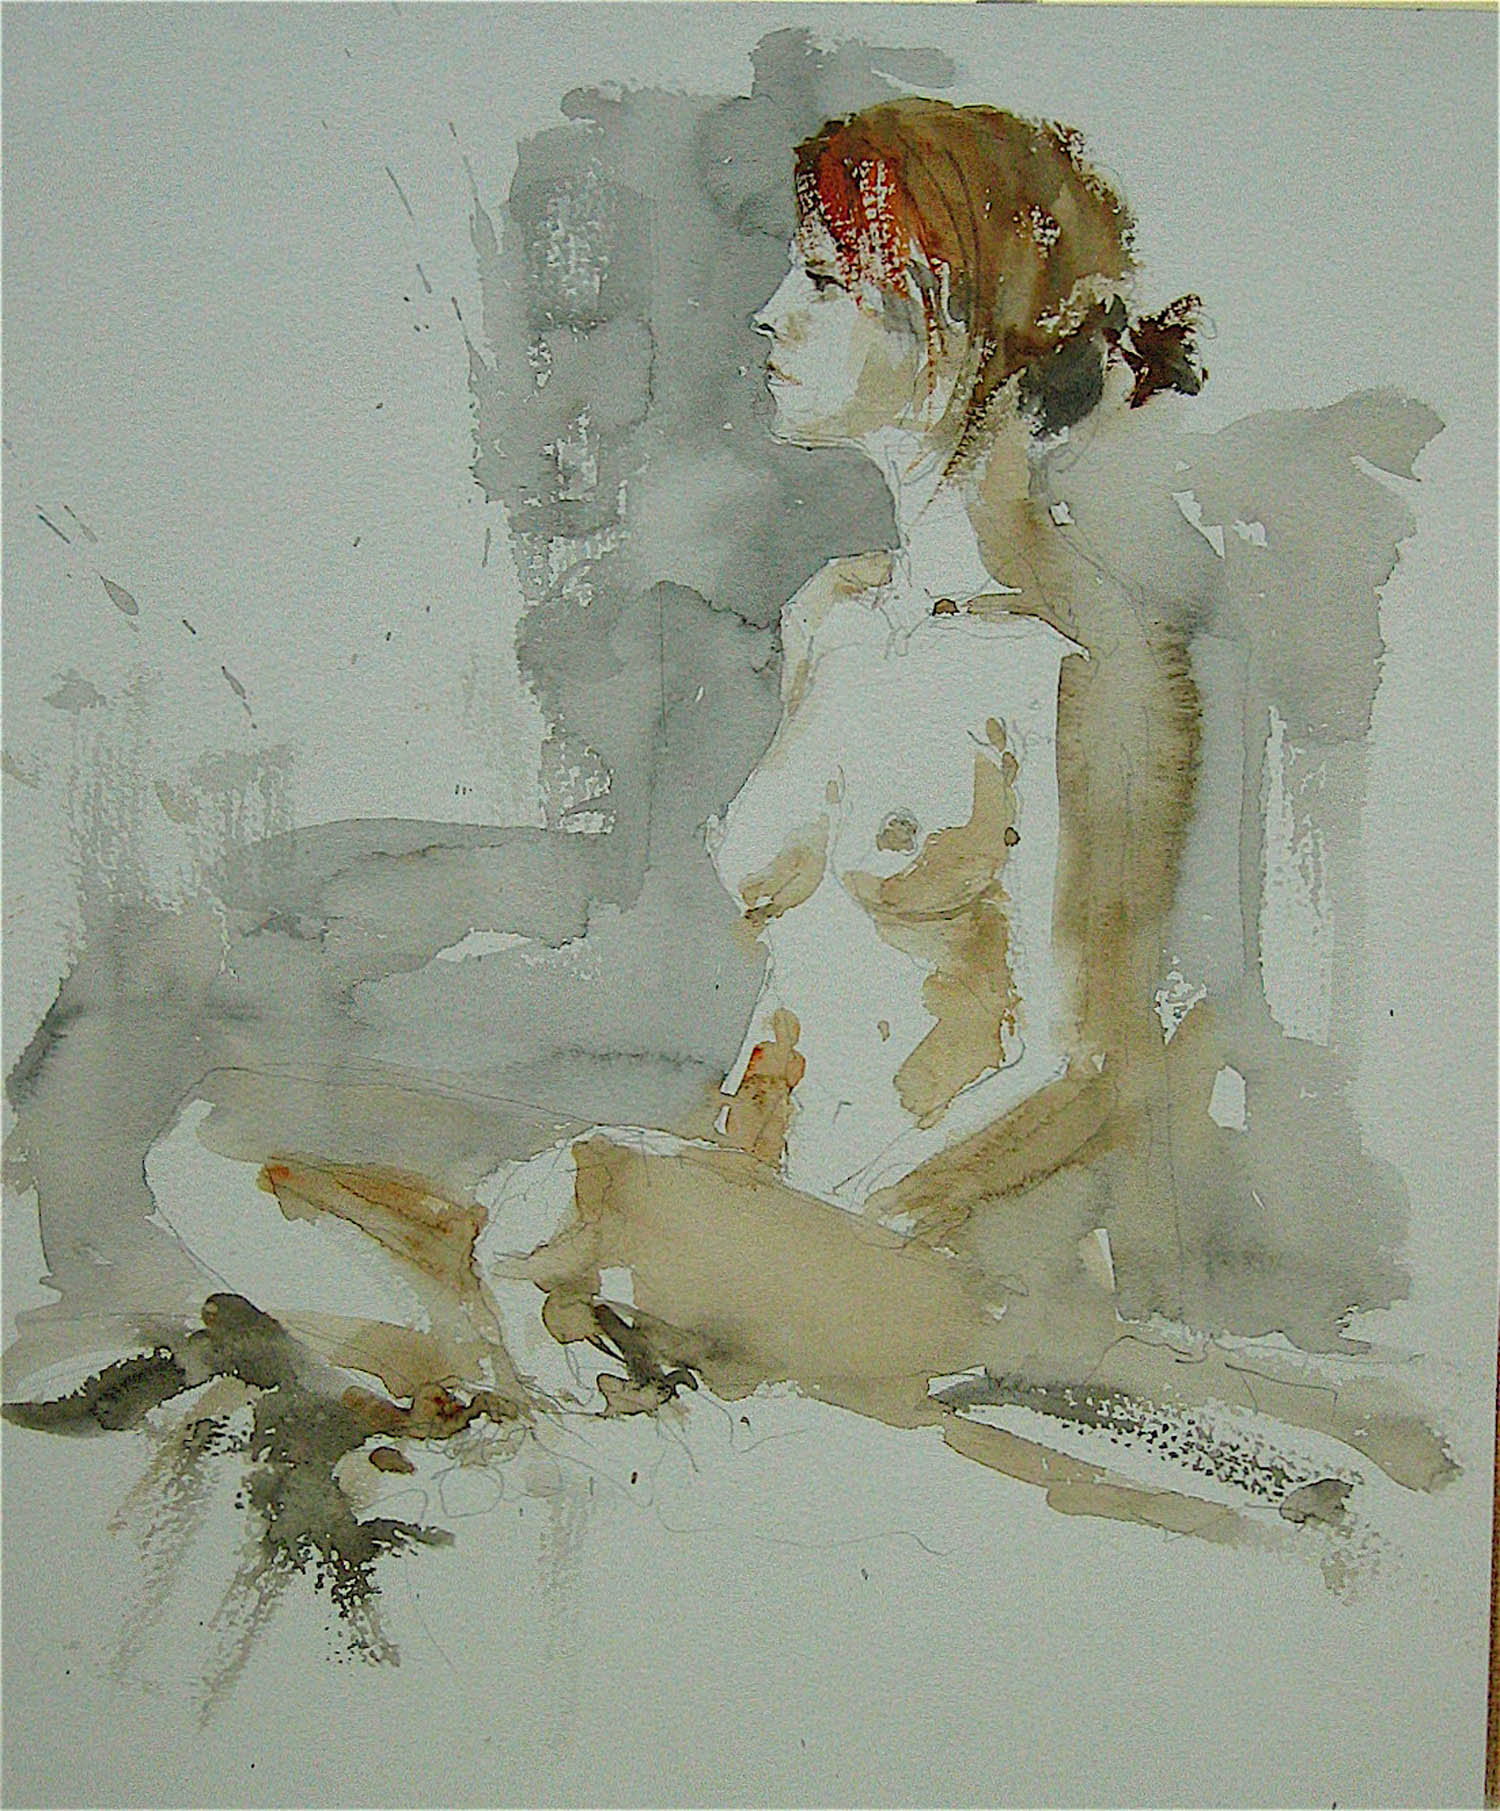 Watercolour: 15 x 11in